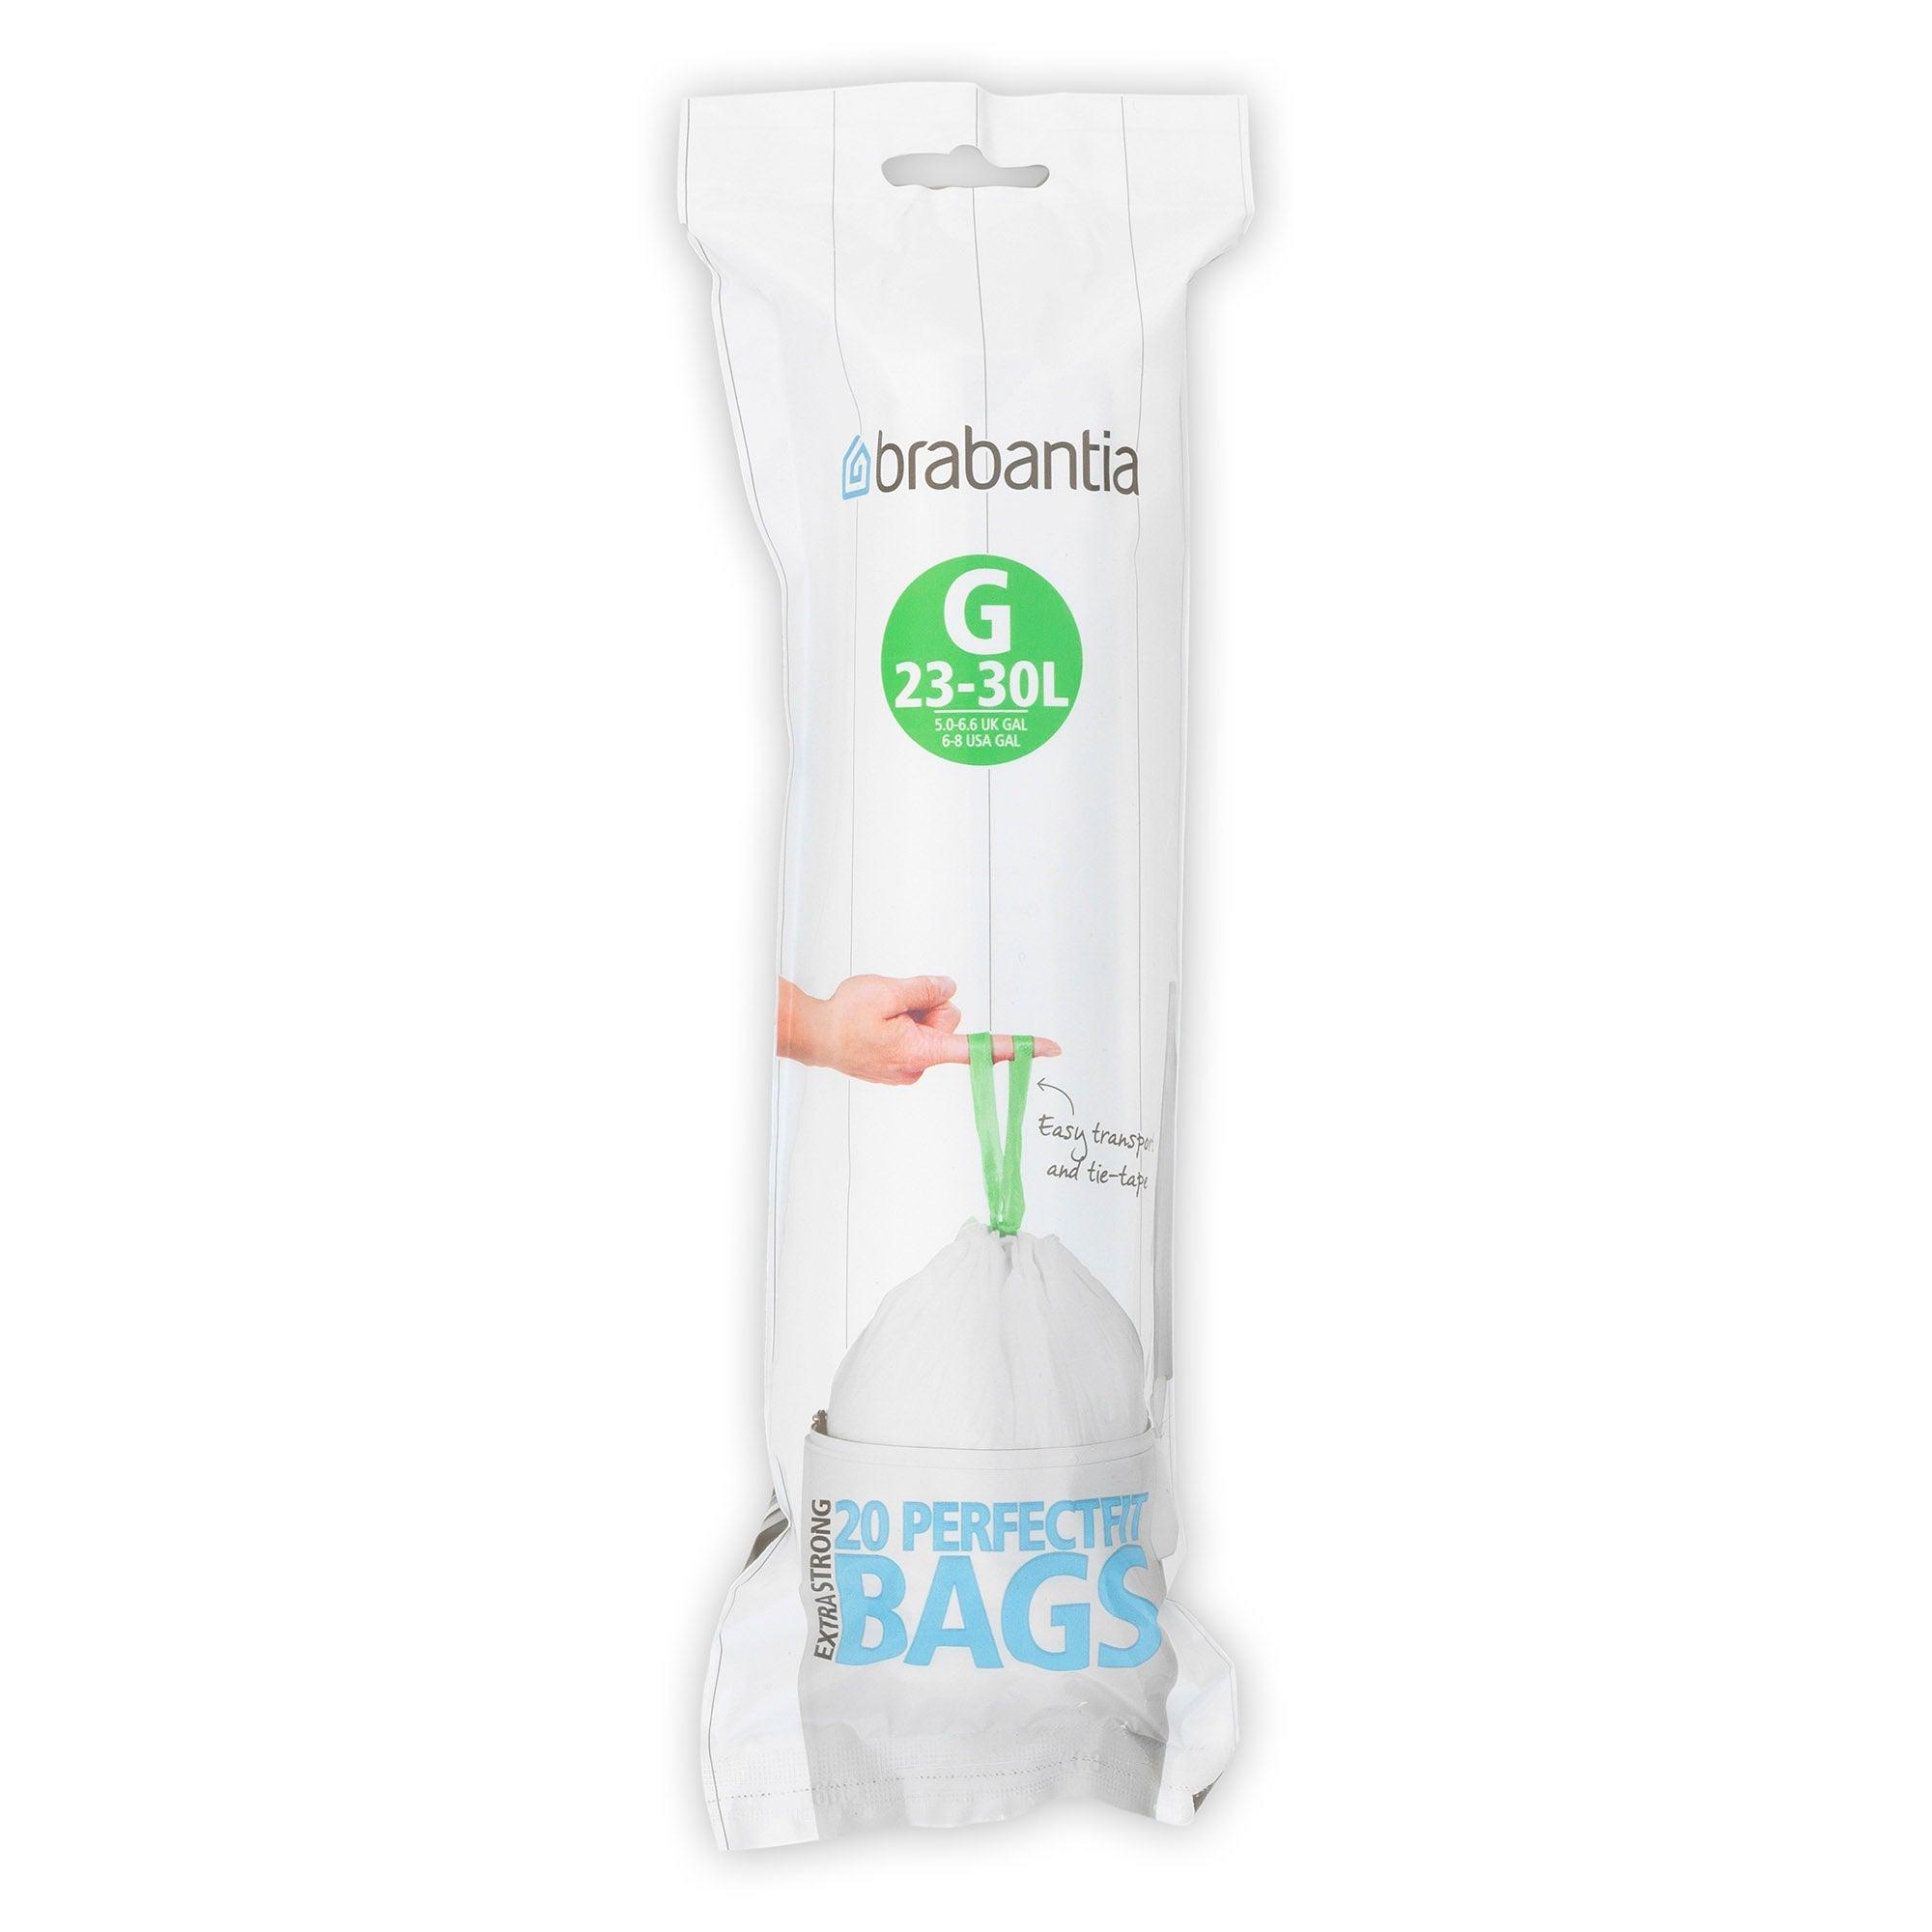 Brabantia 30 Litre Waste Bags